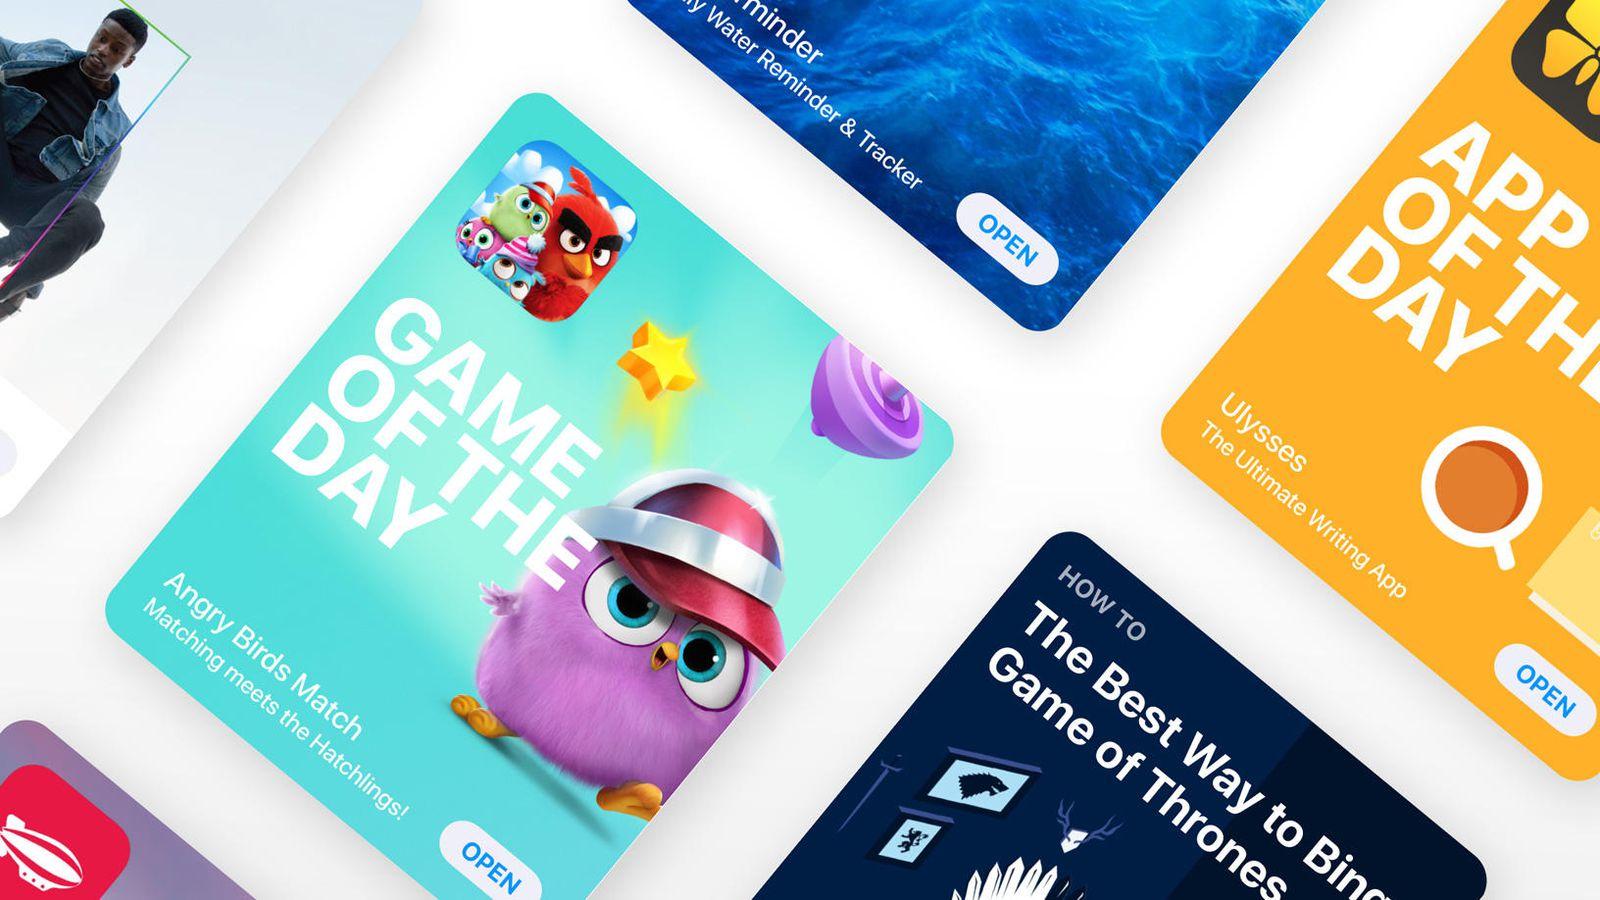 apple-app-store-20180104.jpg